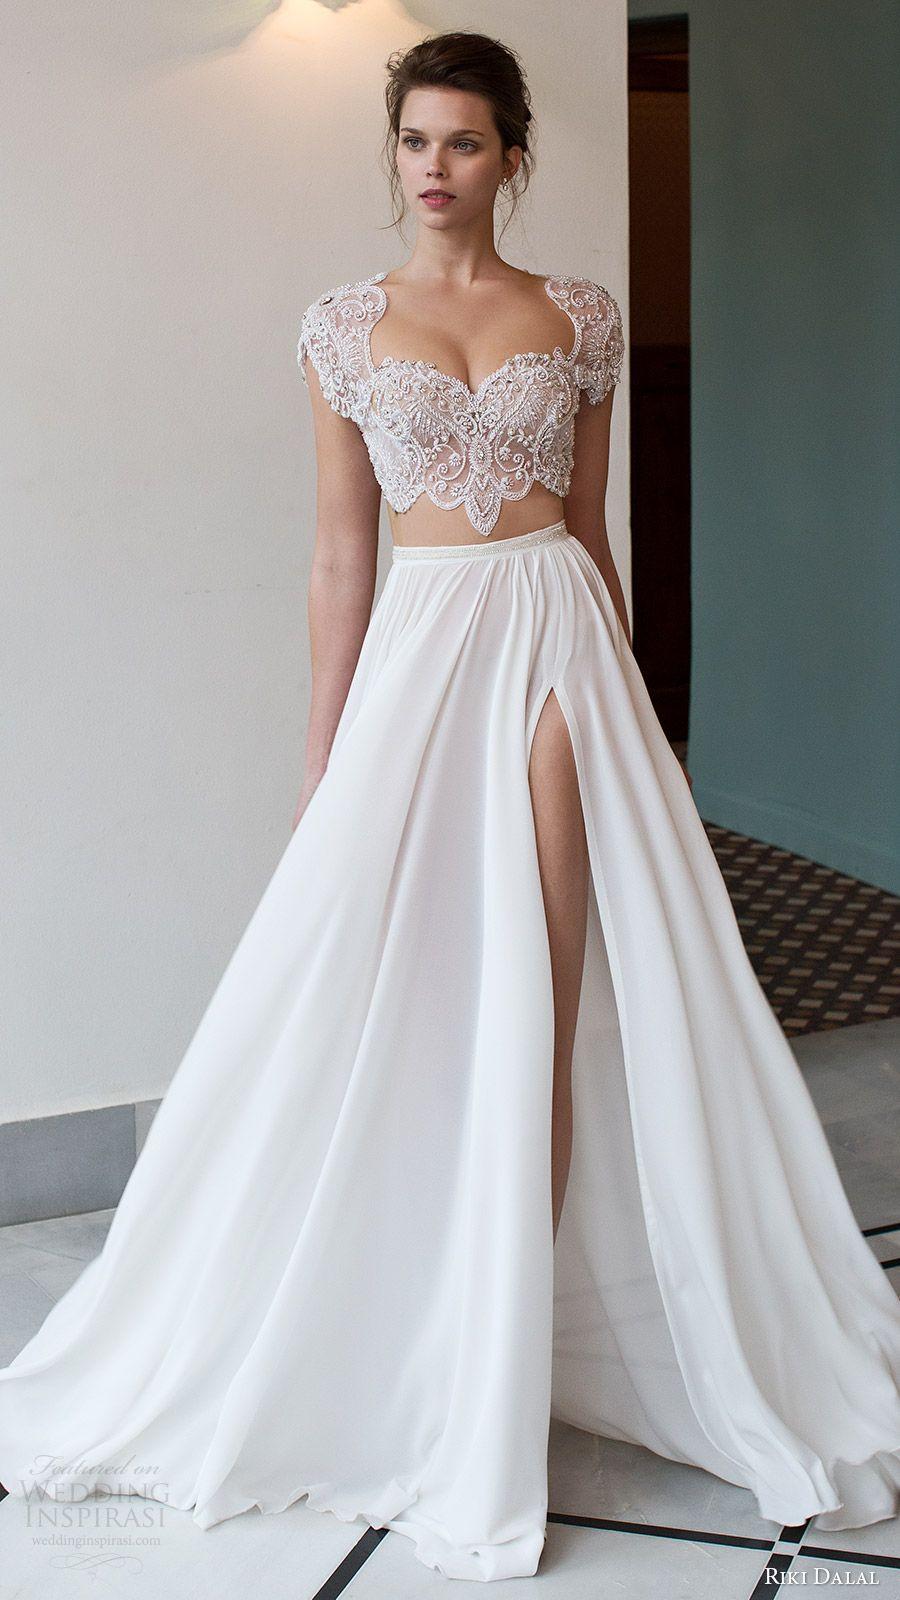 riki dalal bridal 2016 cap sleeves illusion crop top heavily embellished  bodice a line wedding dress (1811) mv slit skirt mv edgy romantic e340186c6651